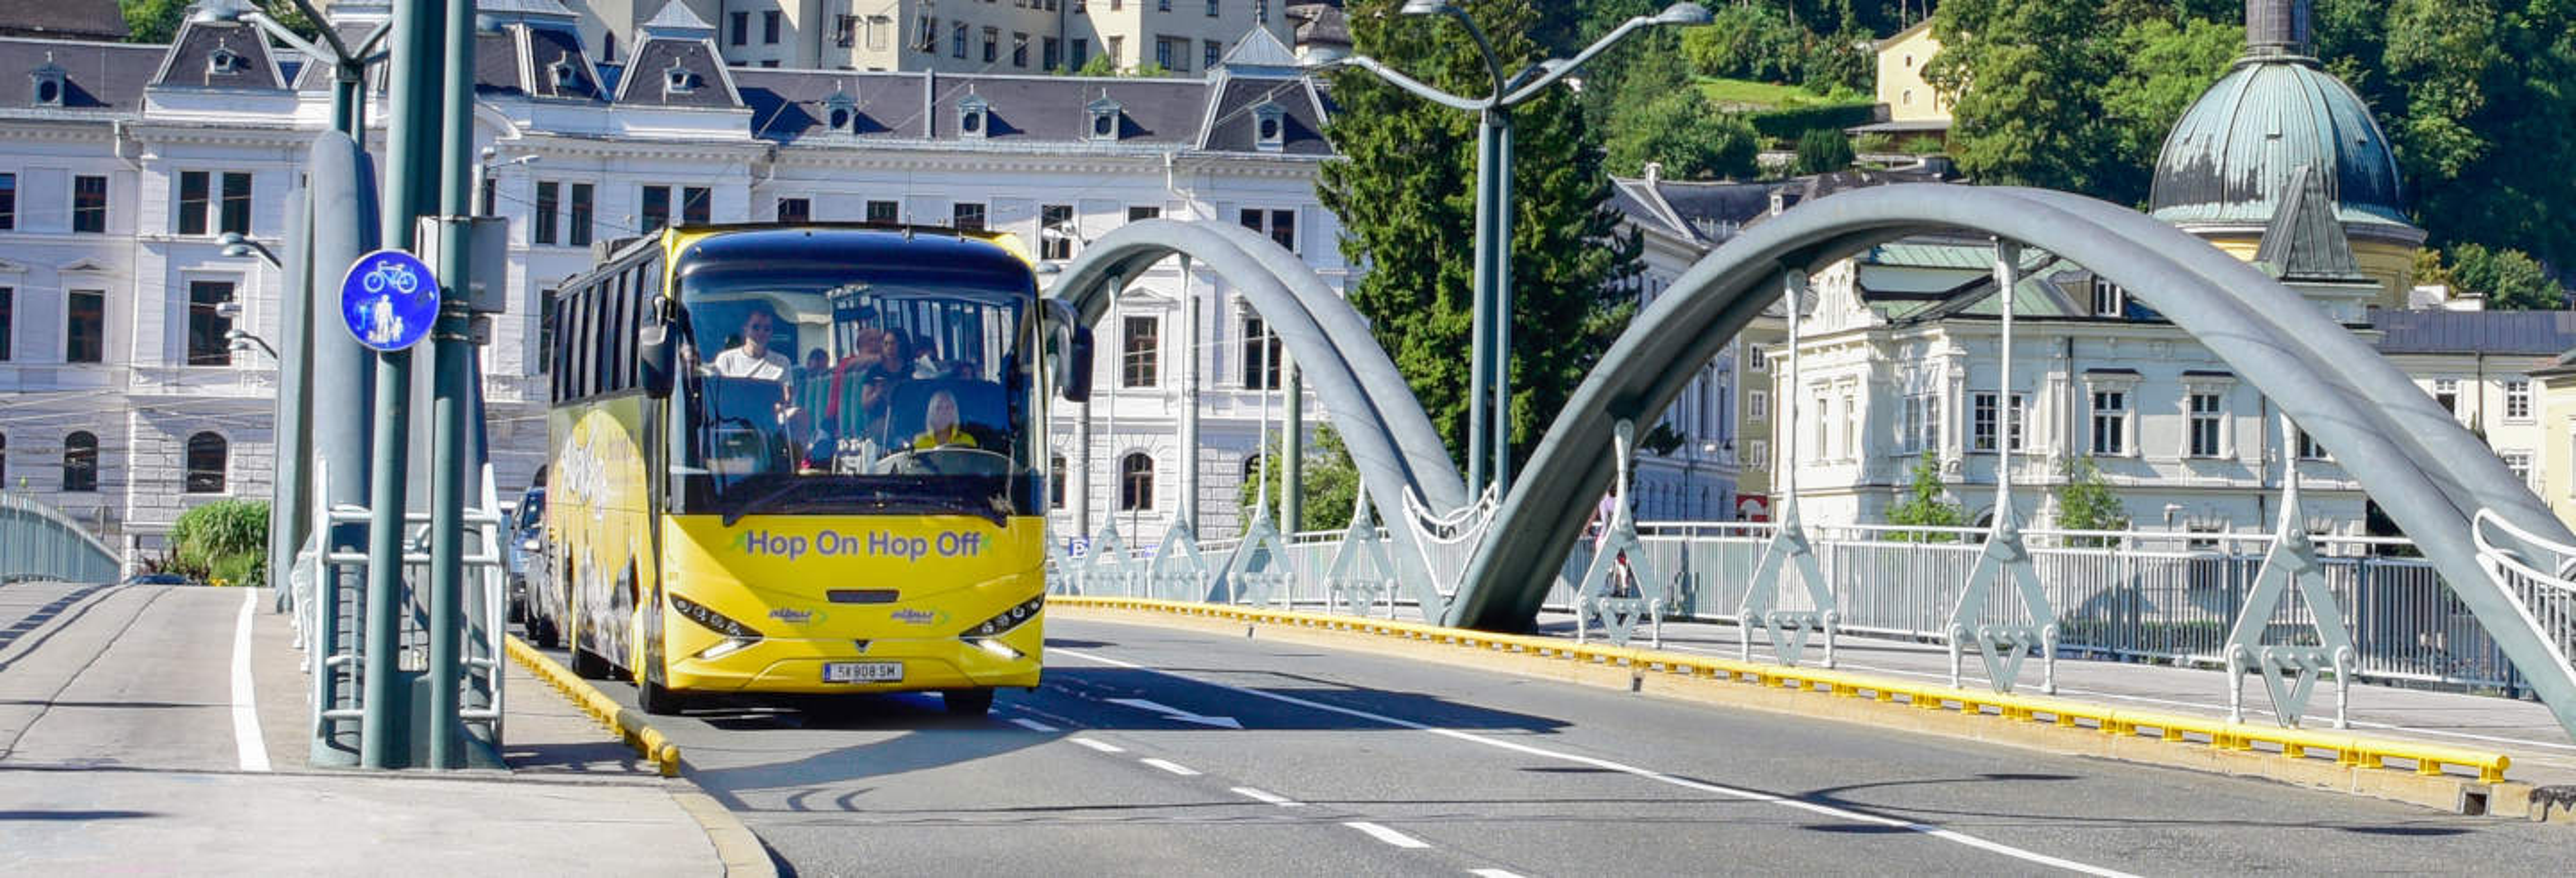 Autobus turistico di Salisburgo